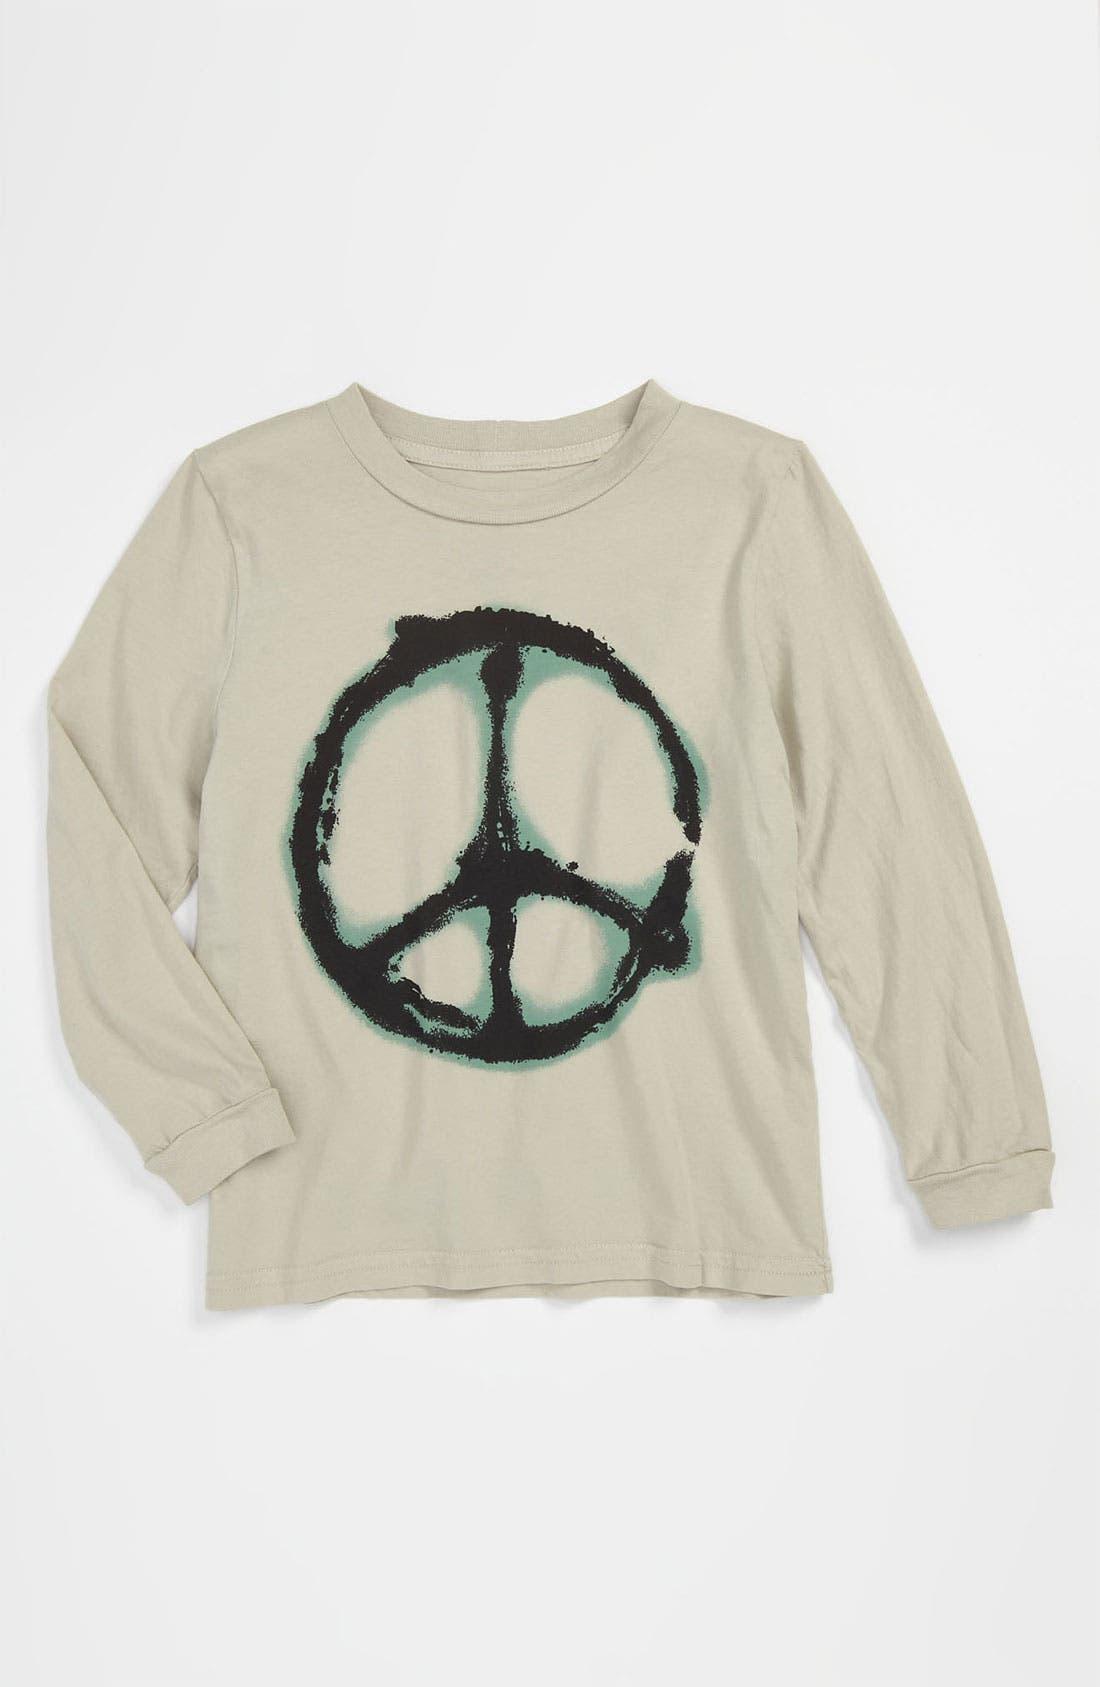 Alternate Image 1 Selected - Peek 'Grafitti Peace' T-Shirt (Toddler, Little Boys & Big Boys)